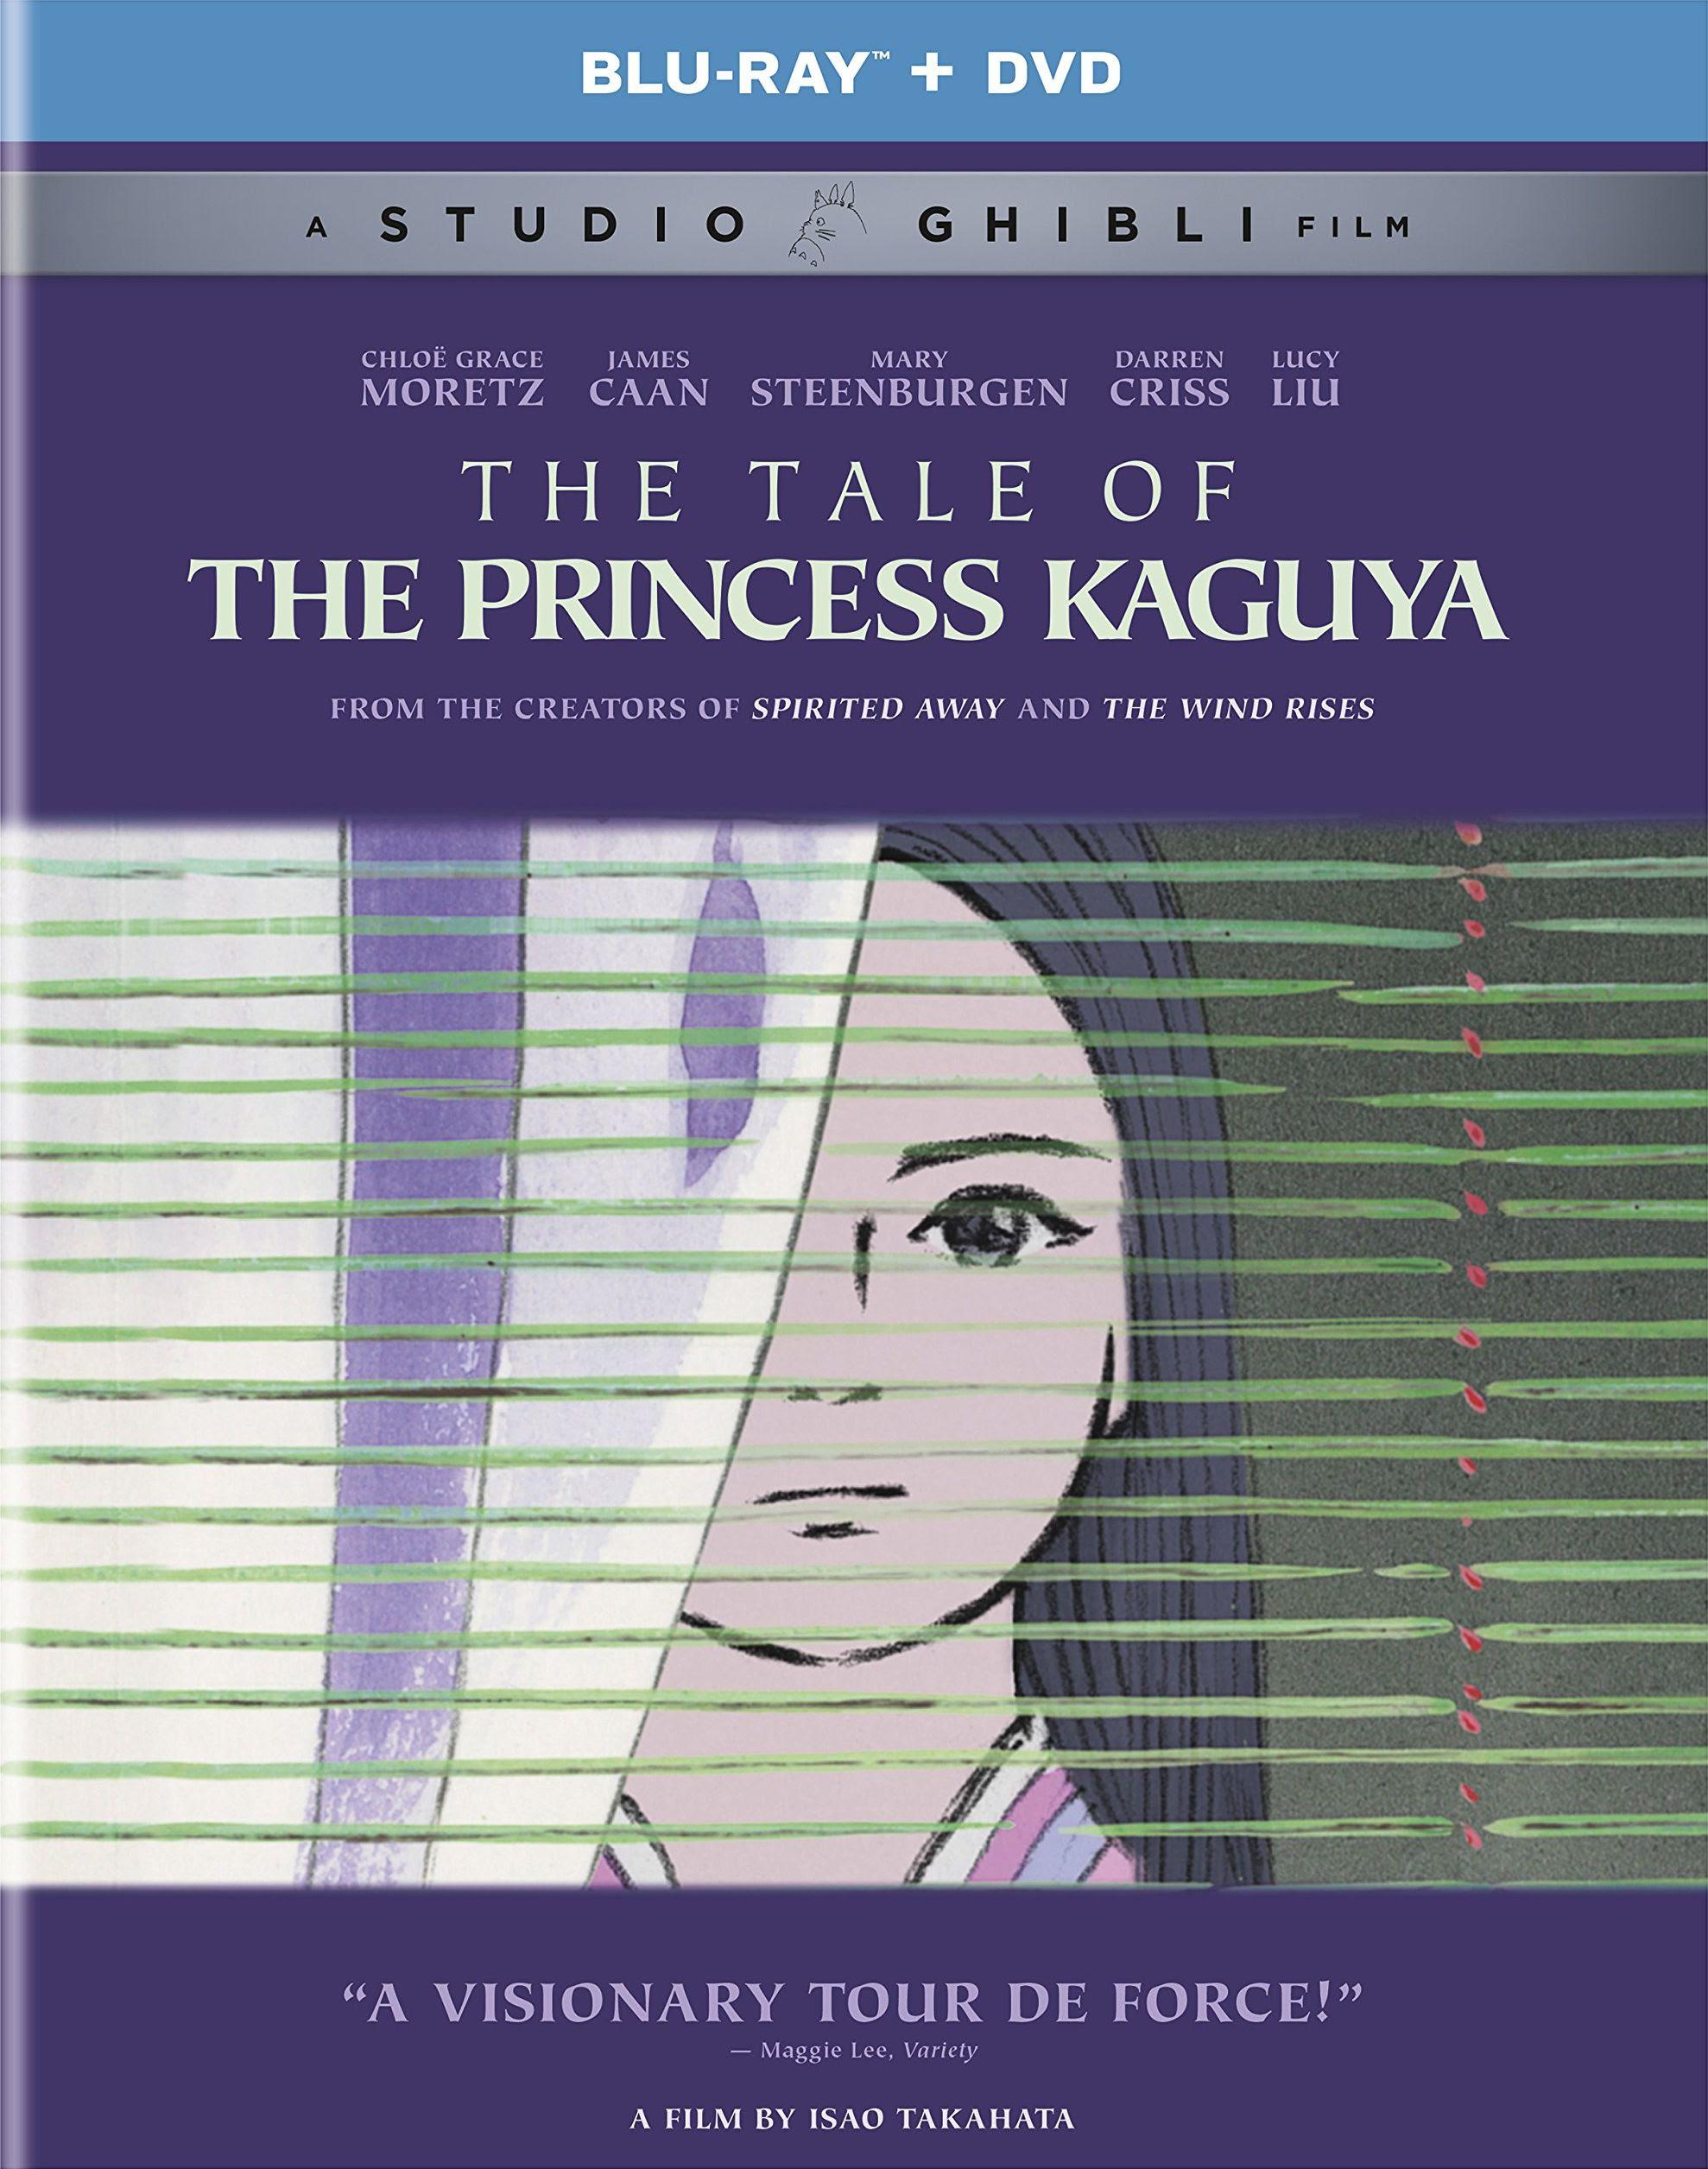 The Tale of the Princess Kaguya Blu-Ray